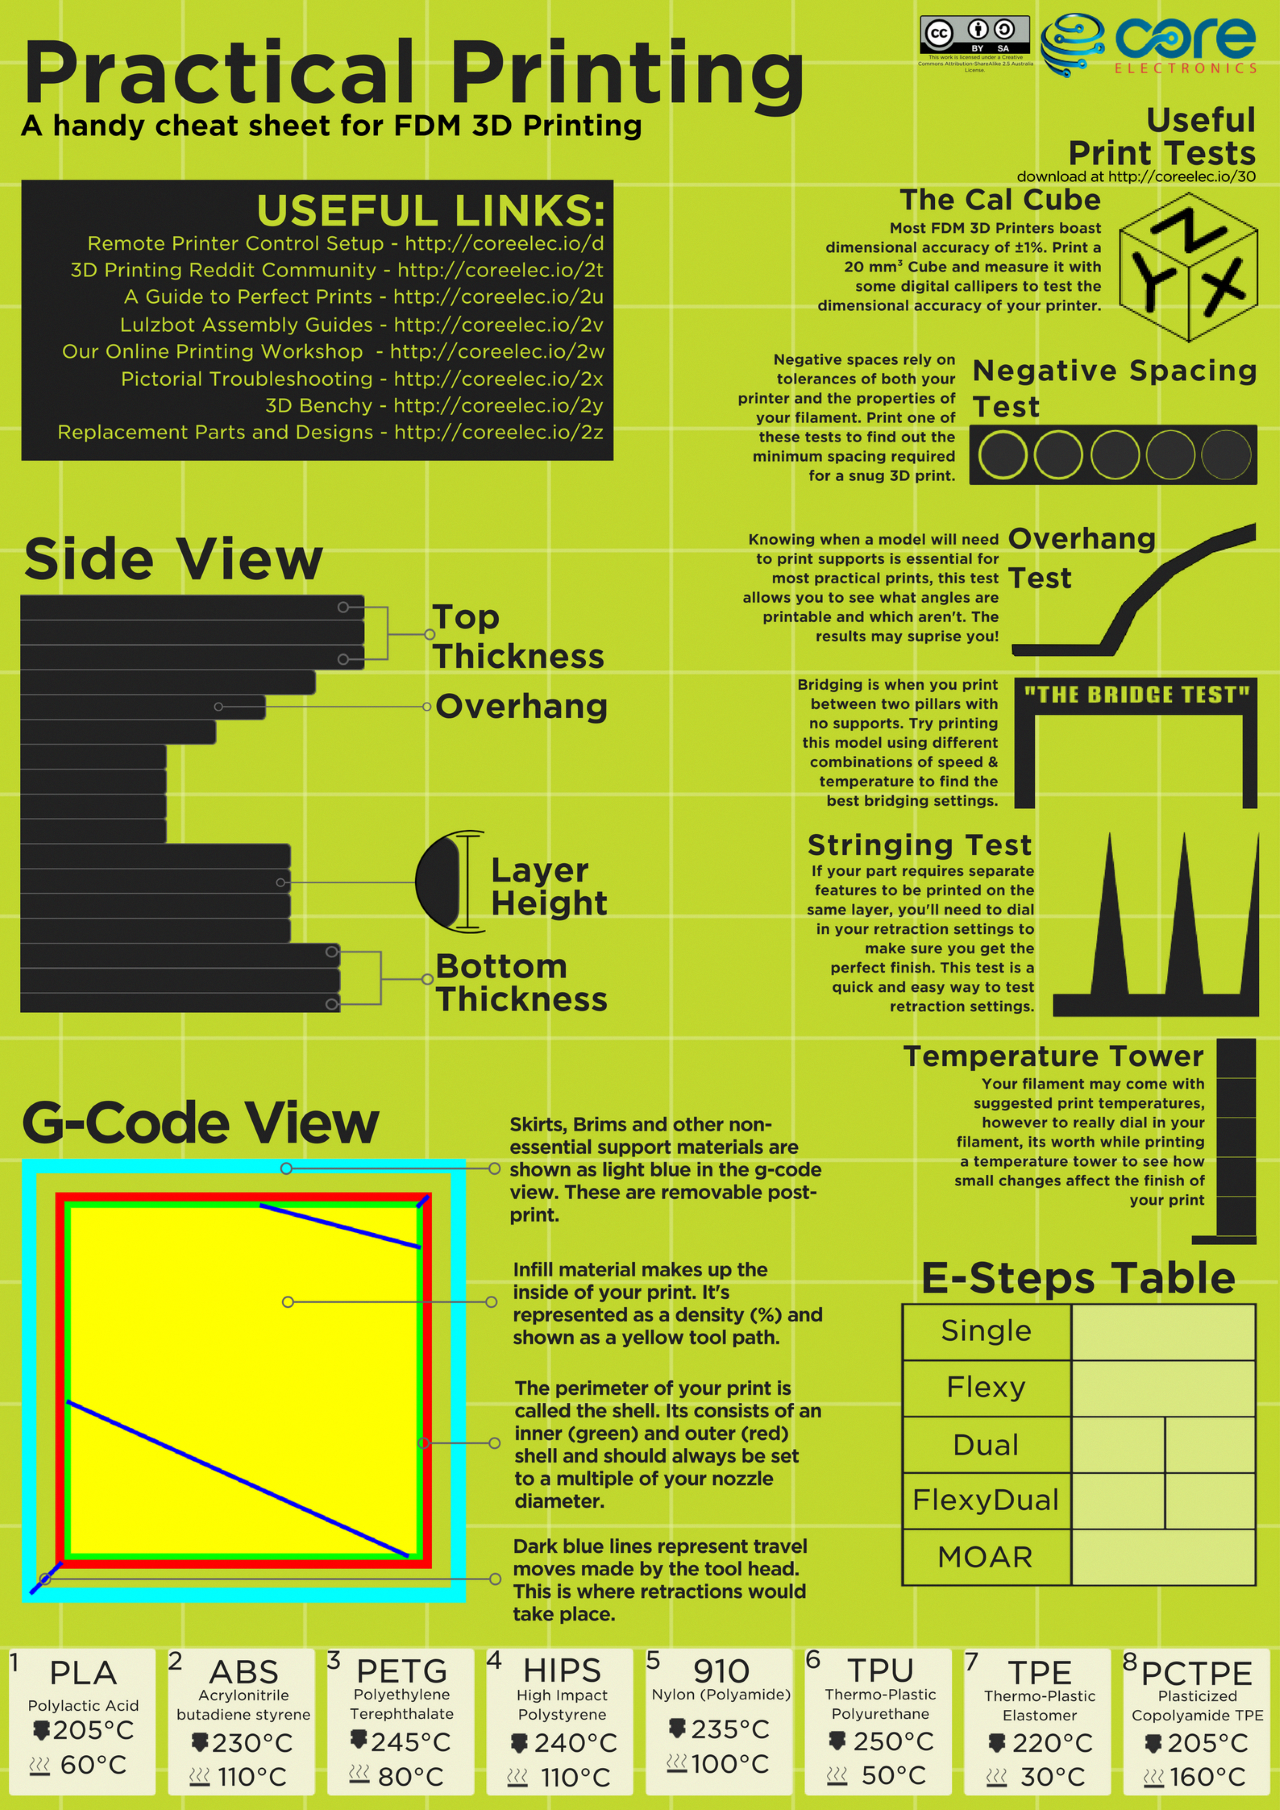 3d Printing Cheat Sheet Tutorial 3d Printing 3d Printing Business 3d Printer